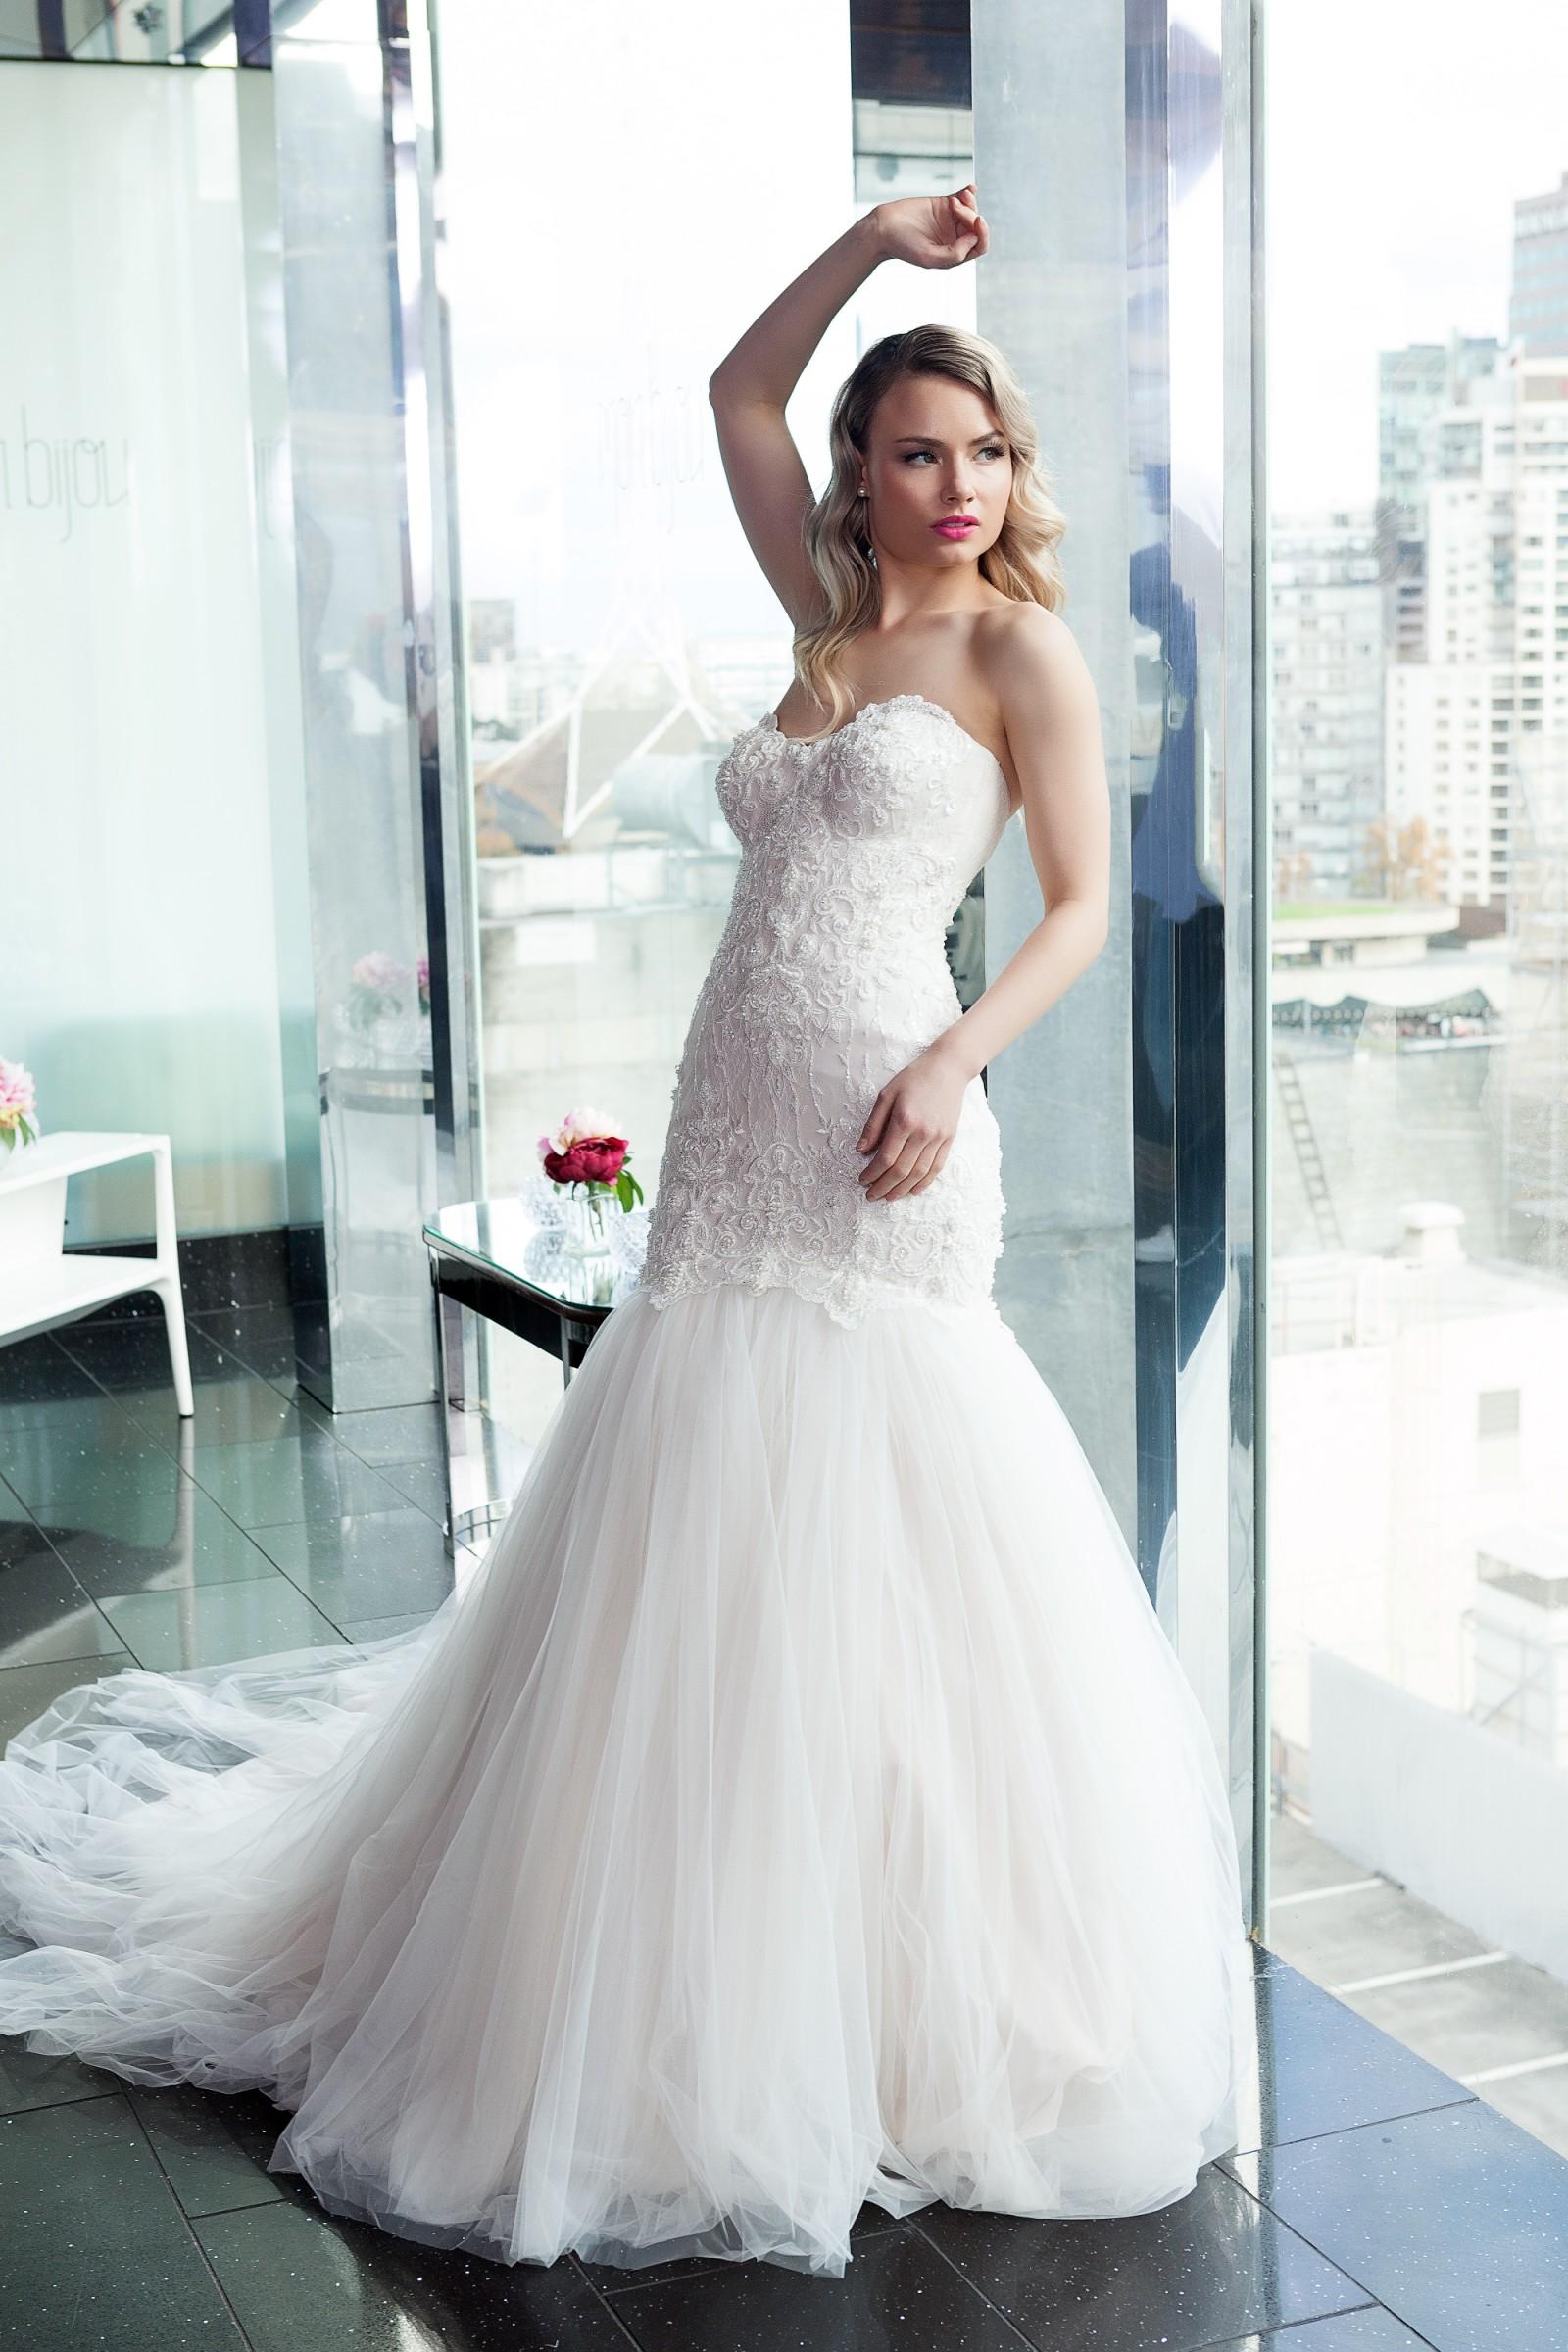 Zhanel Bridal Couture Ready To Wear Designer Range Wedding Dress On Sale 57 Off